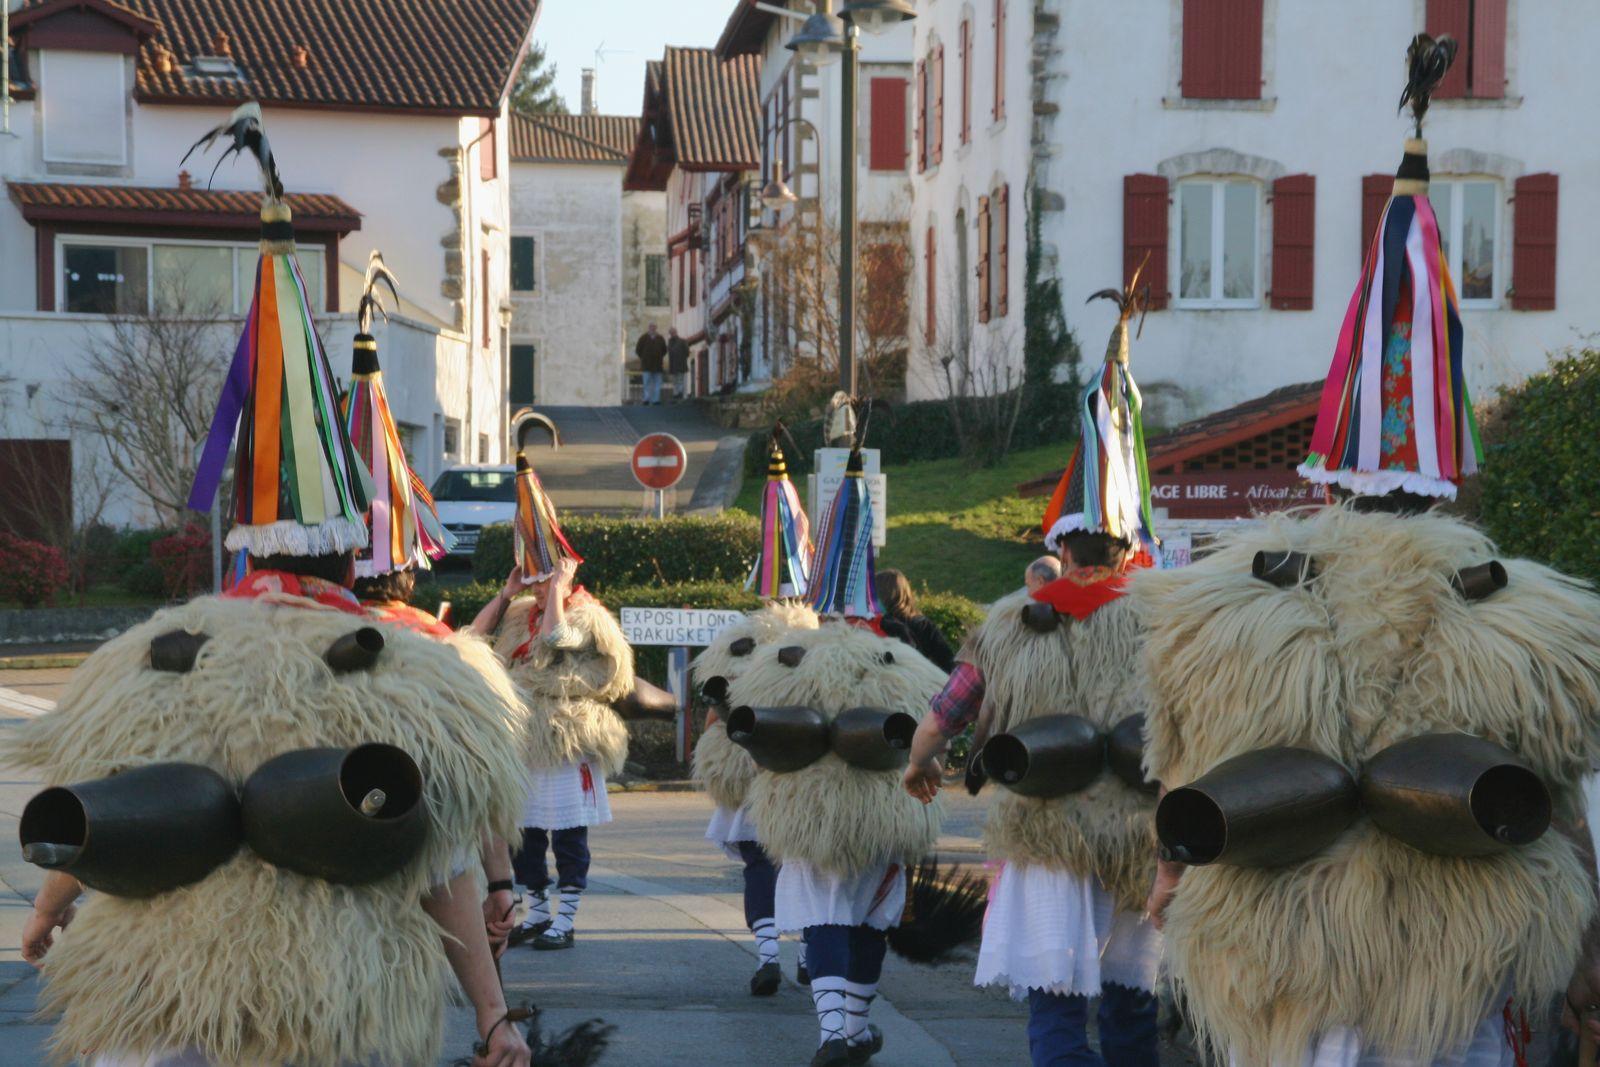 Joaldunak de Ituren (Navarra) en el carnaval de Ustaritz (País vasco francés)